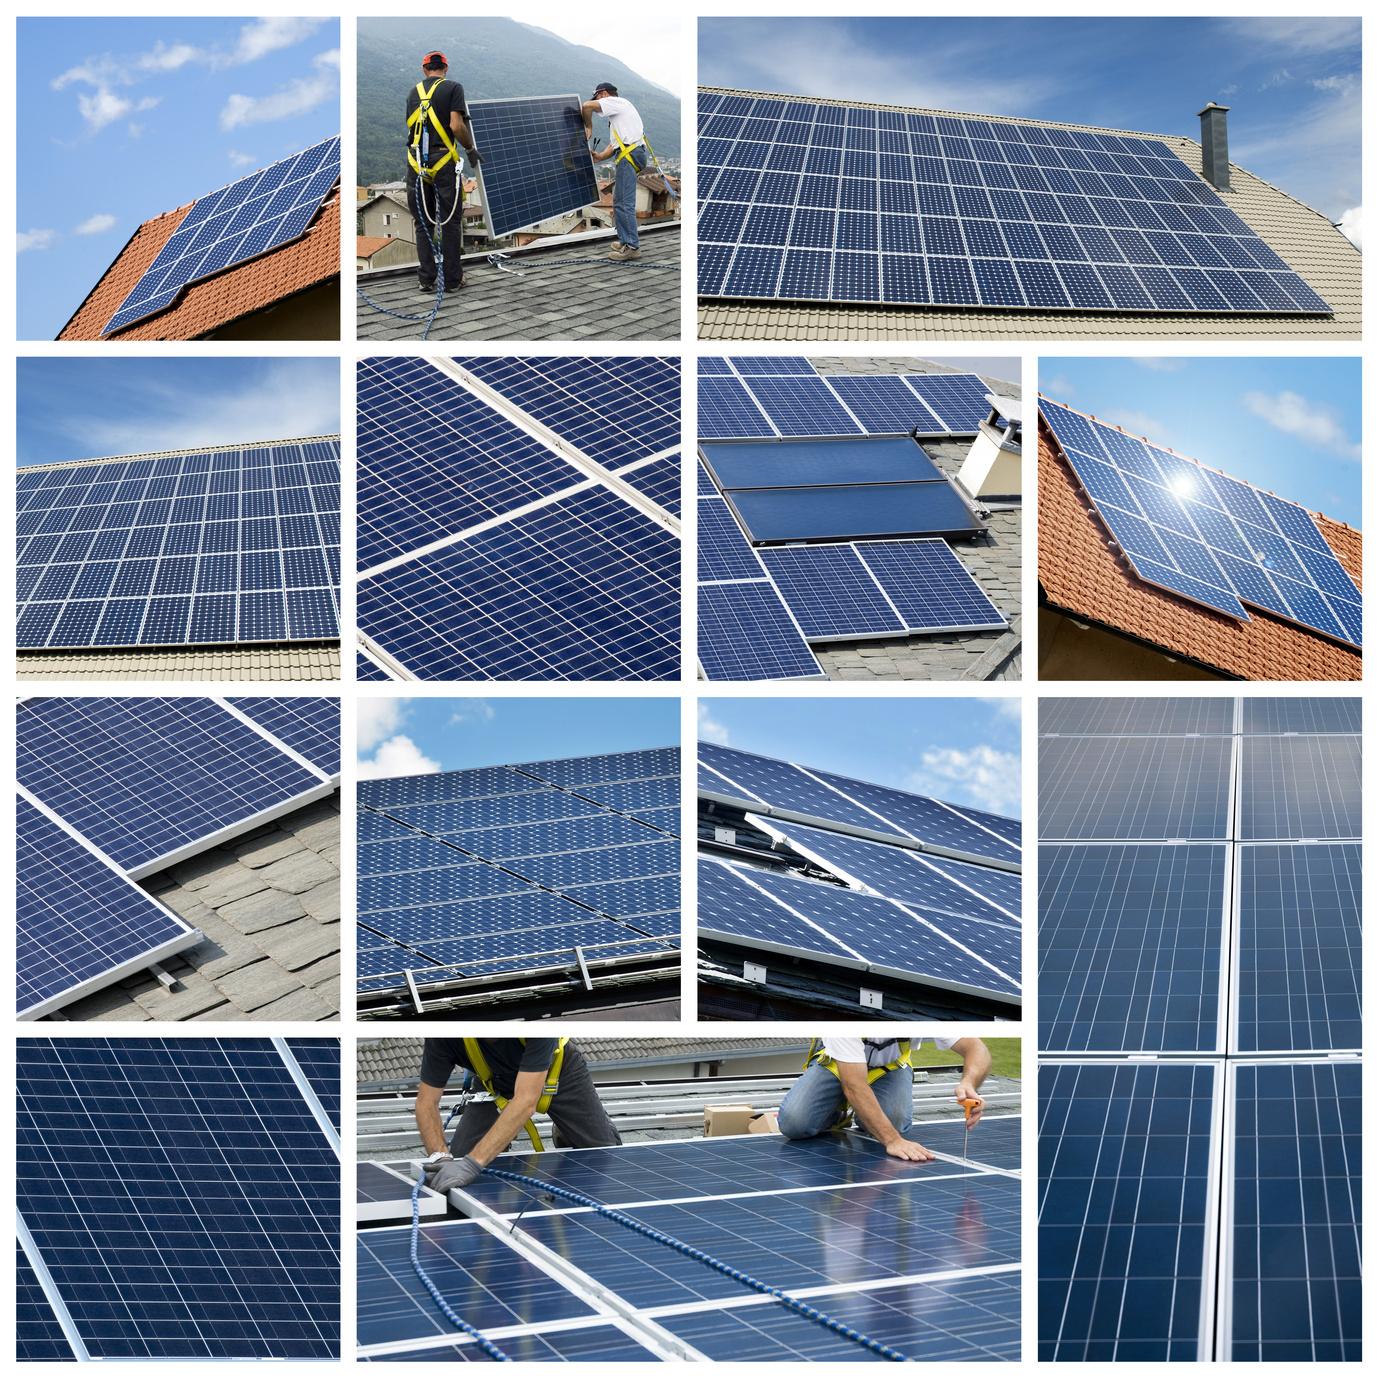 Solar panels installing - collage